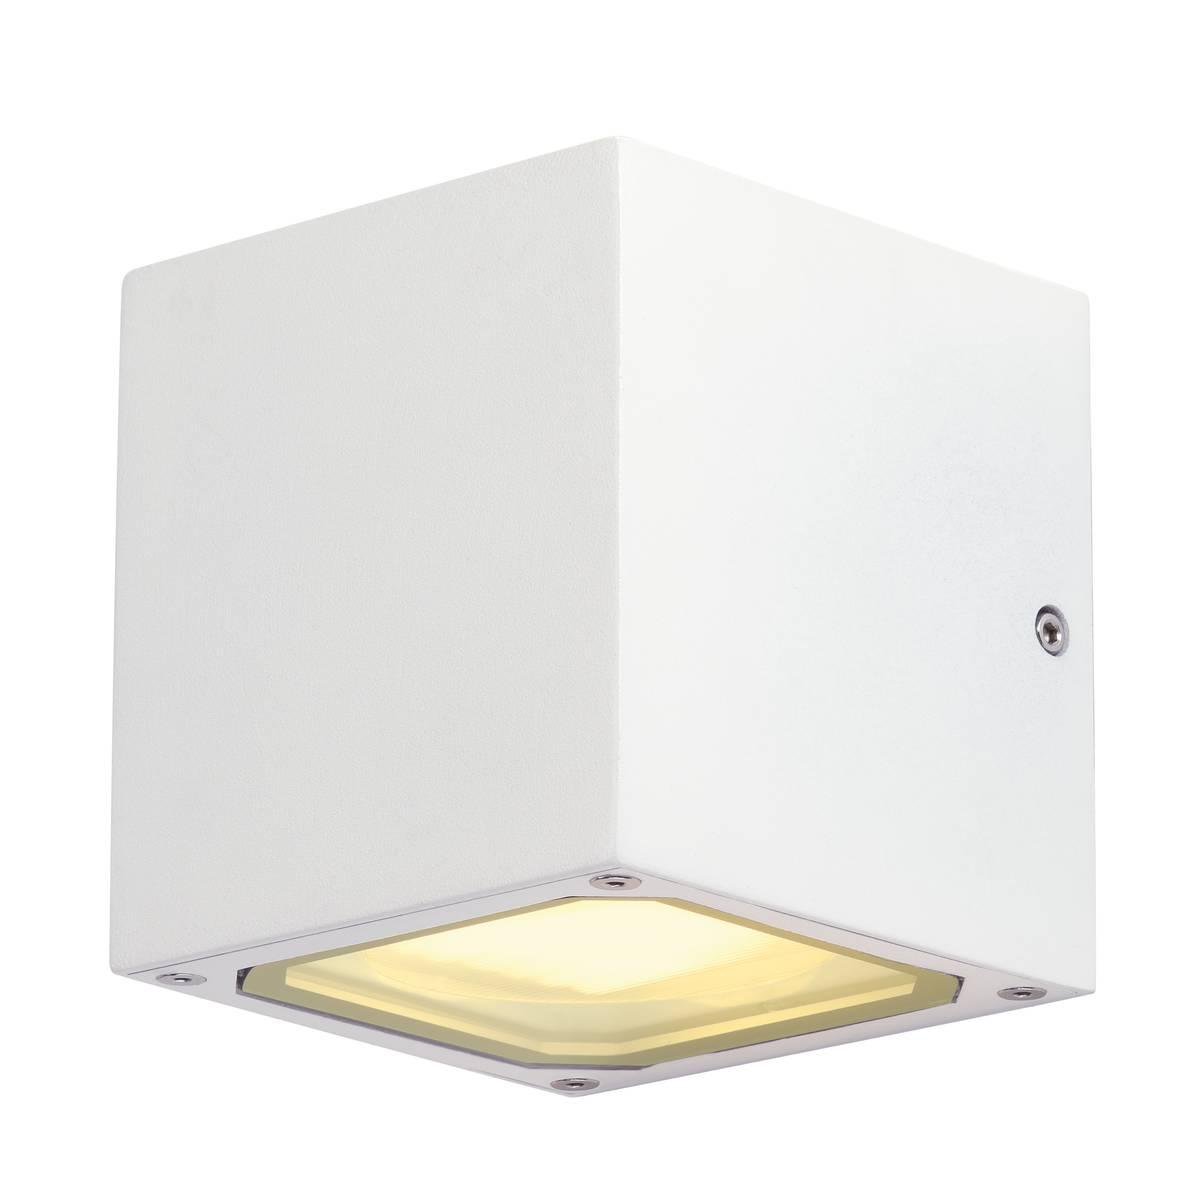 SLV buiten wandlamp Sitra Cube - gx53 - wit